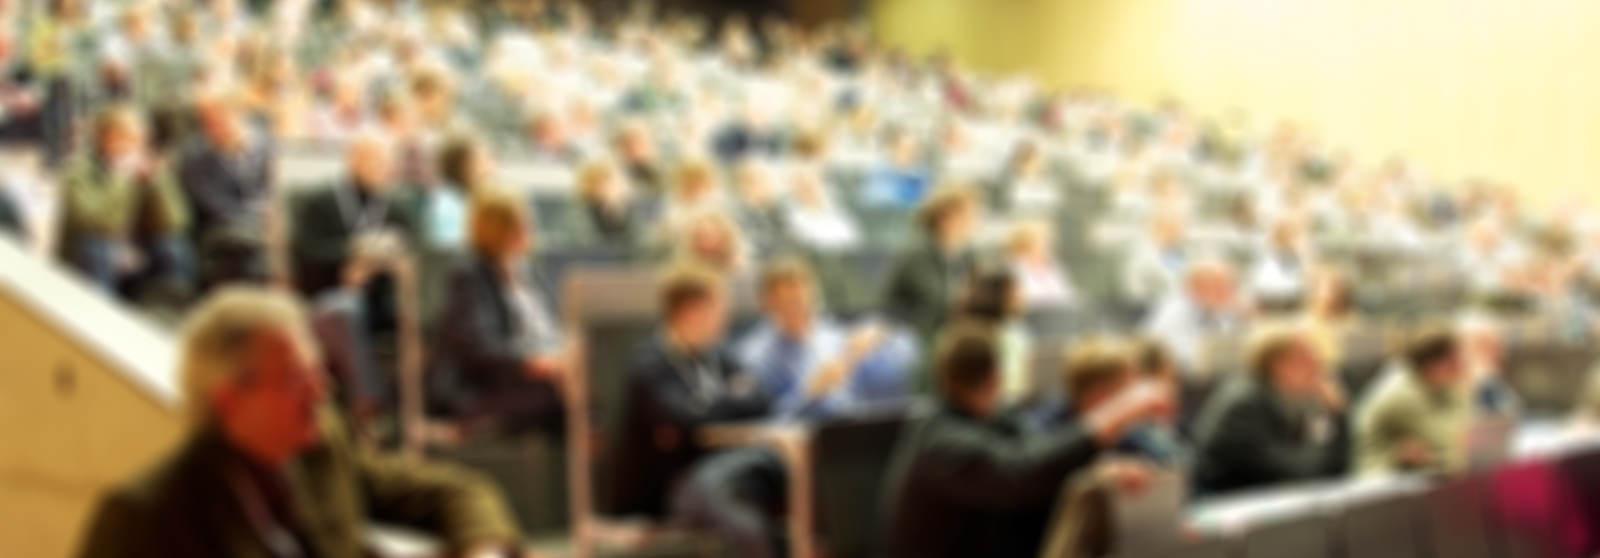 Planung Symposium 2021 noch nicht abgeschlossen